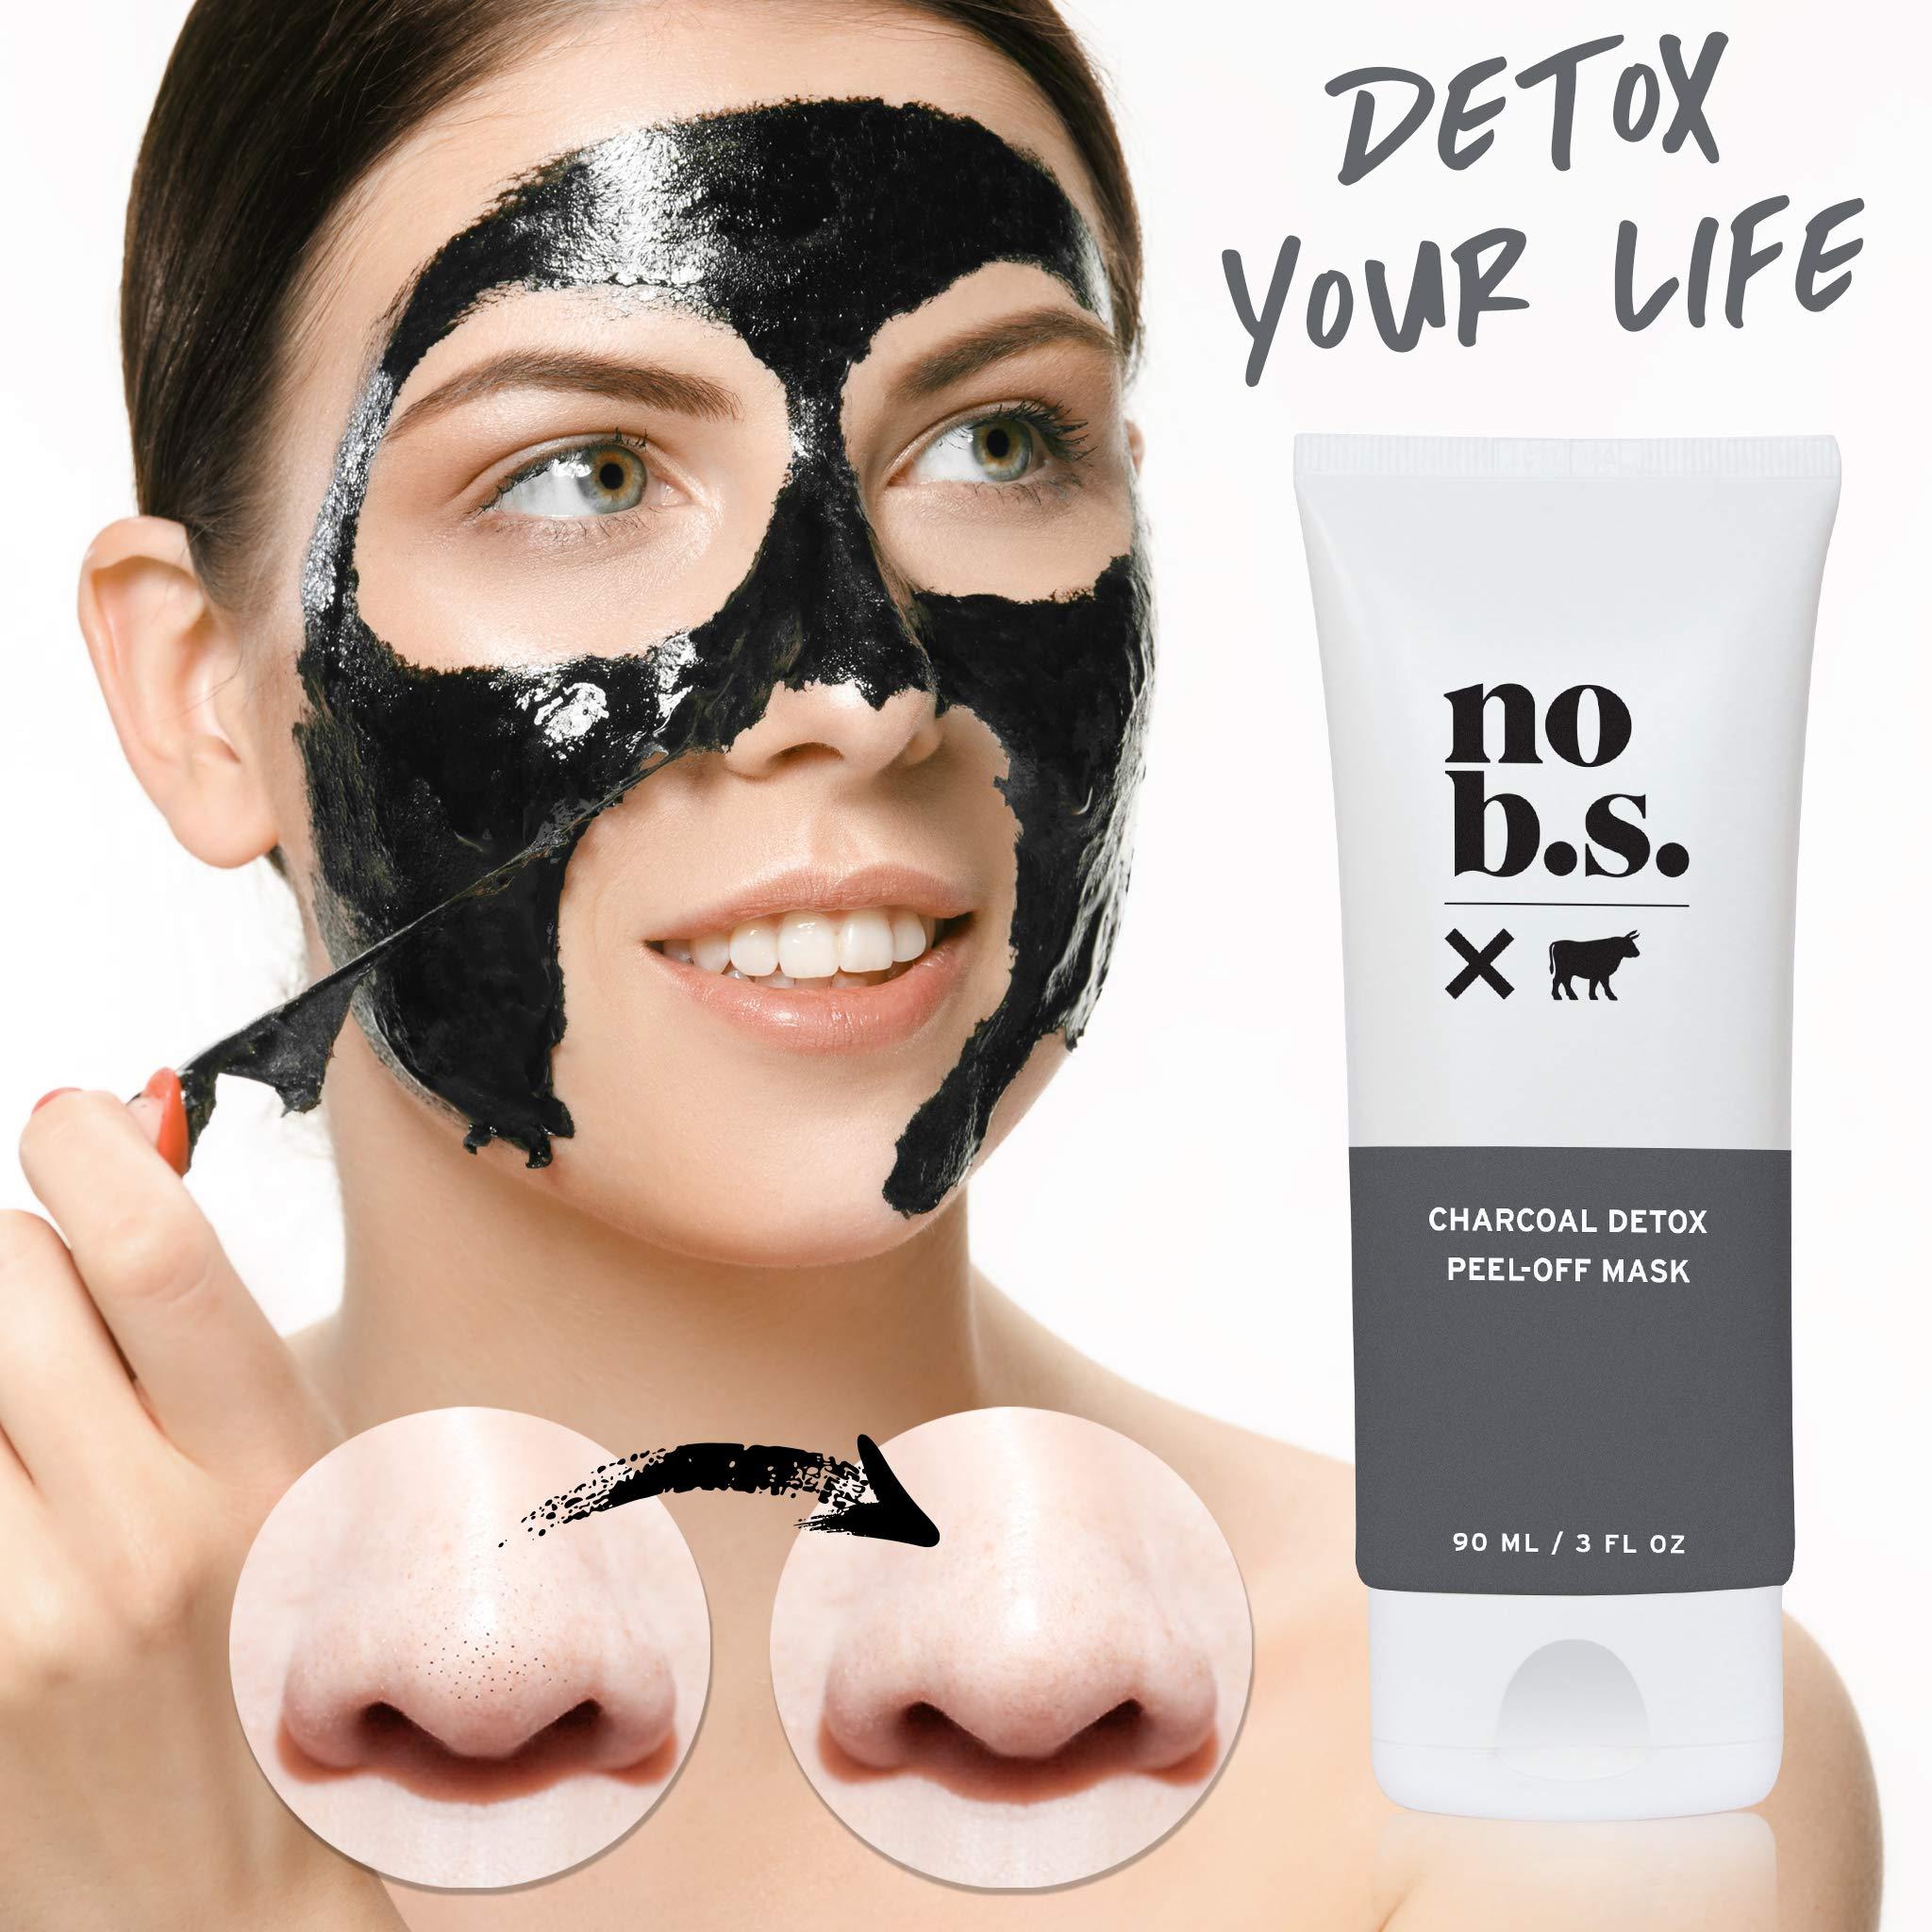 No B.S. Charcoal Peel Off Mask - No Hype, No Fad Deep Cleaning Blackhead Remover Mask